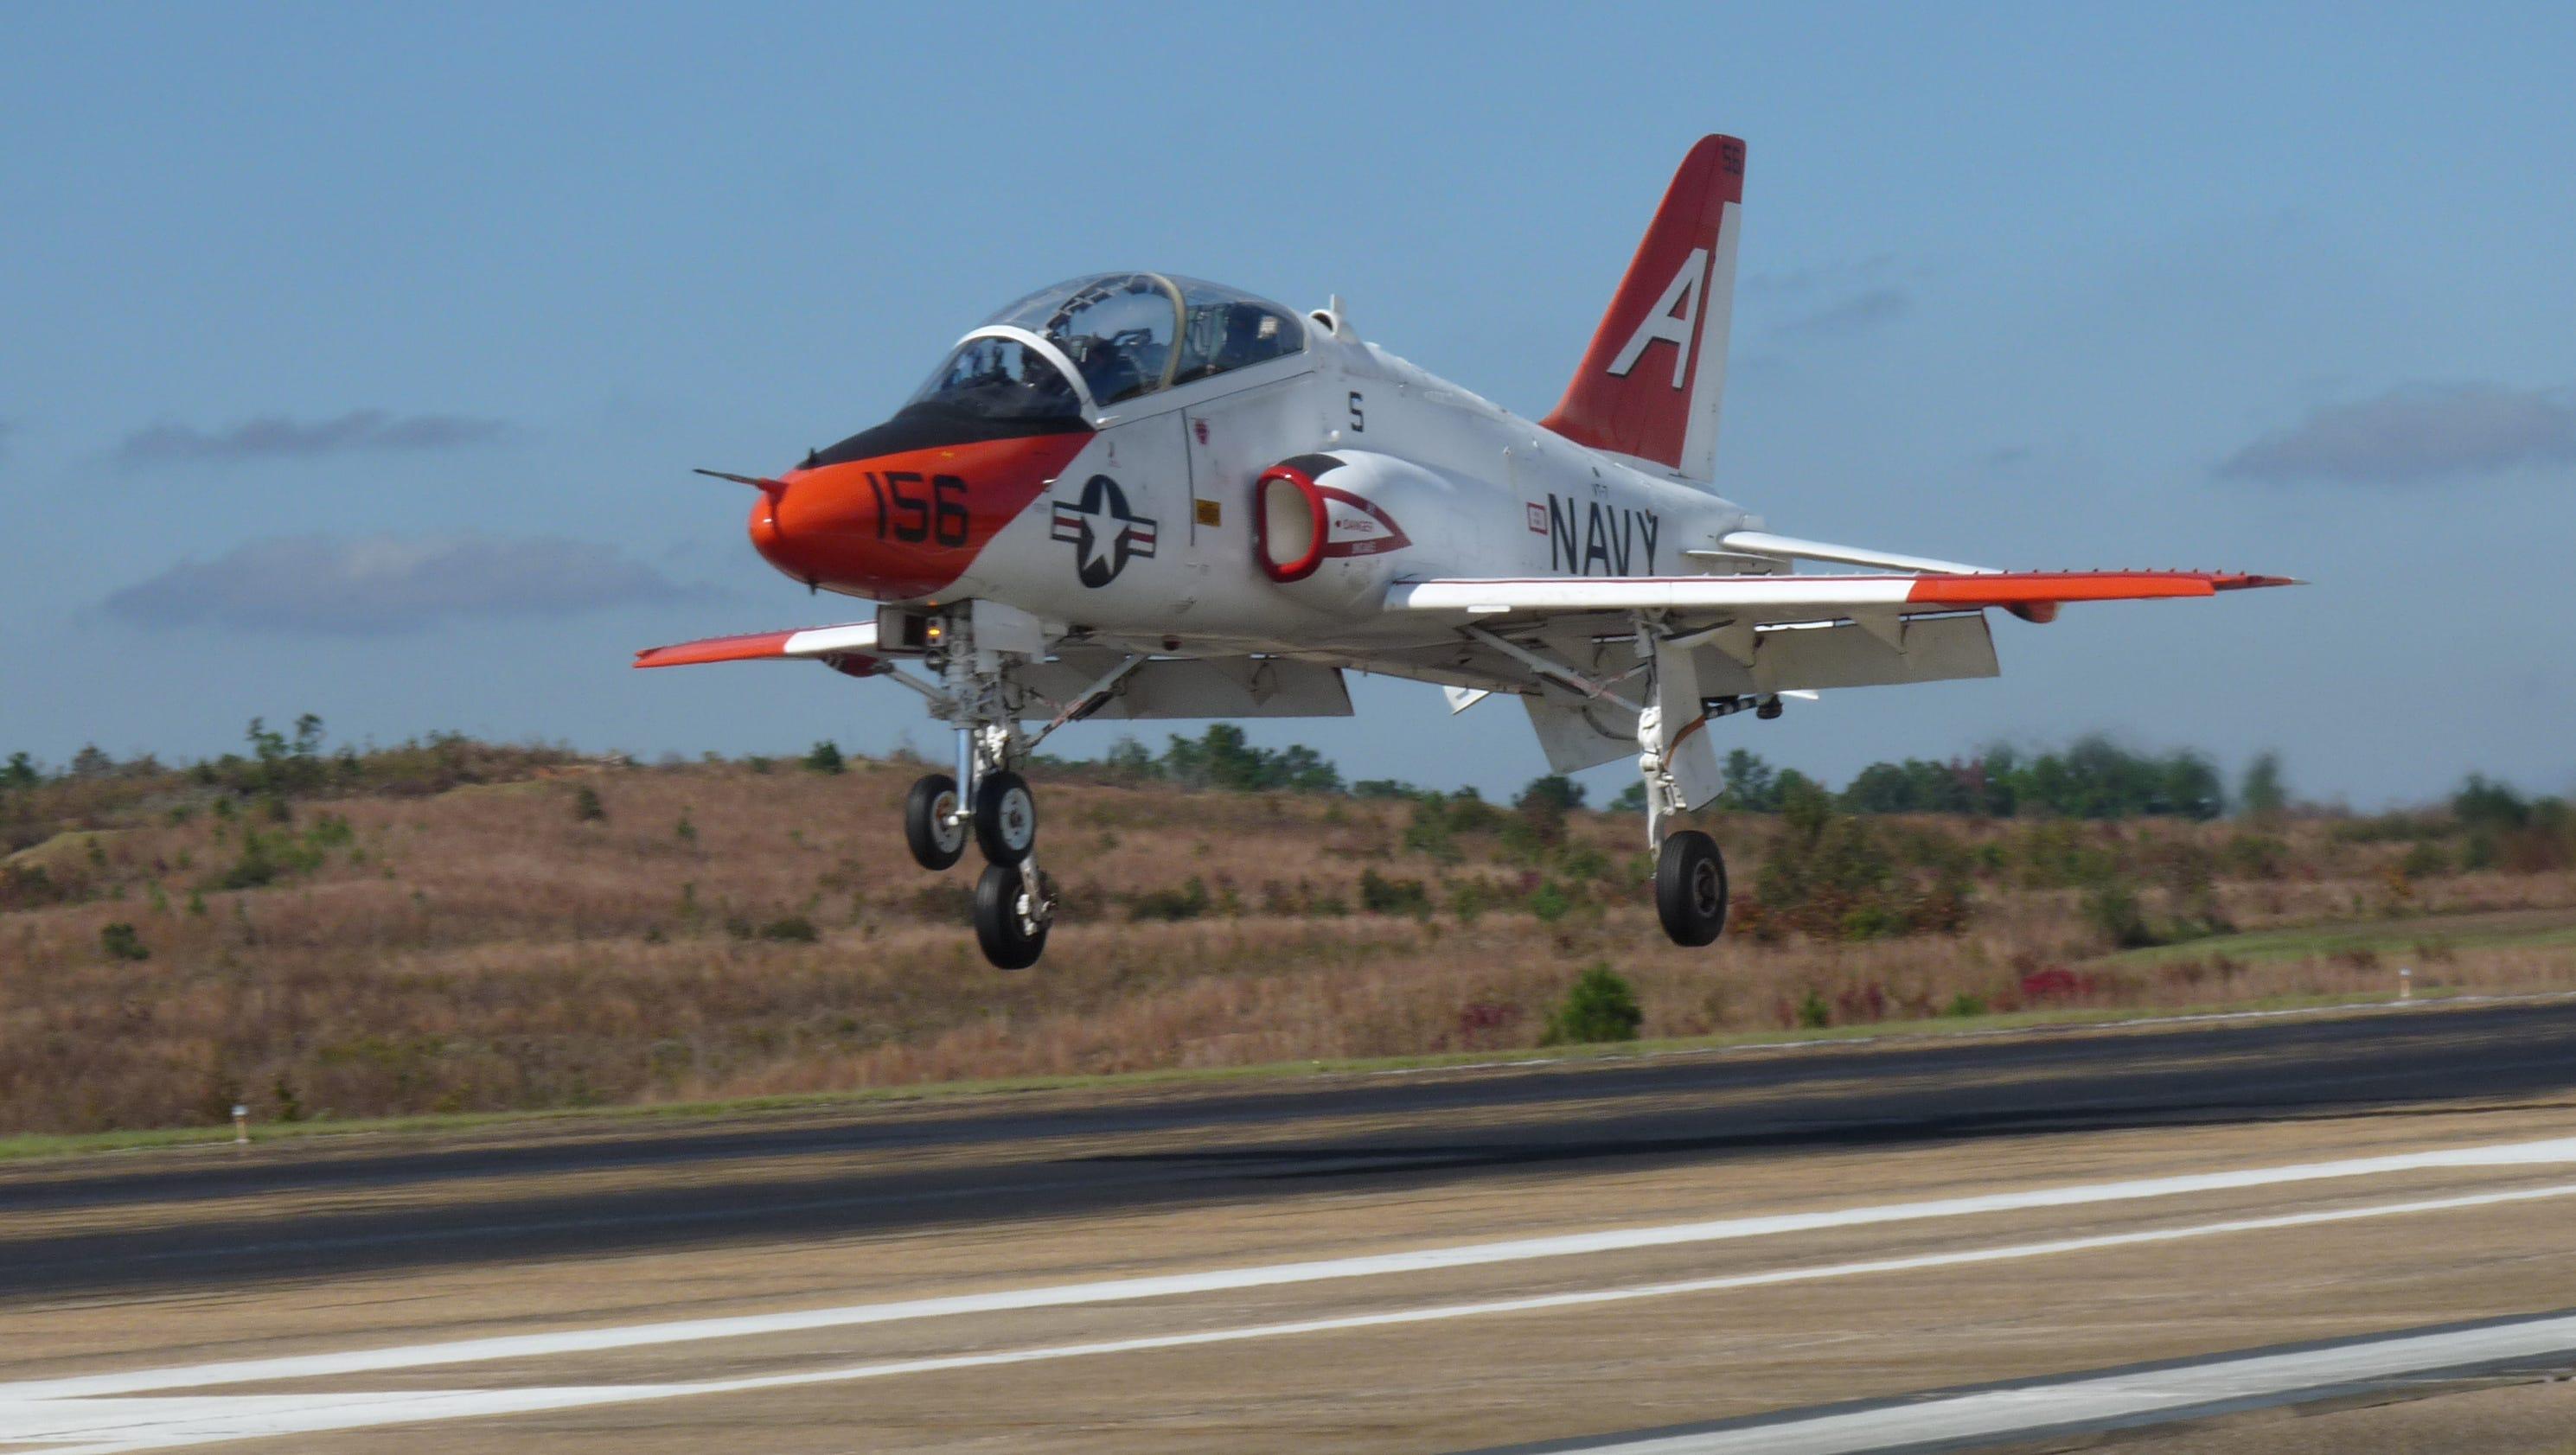 Navy Cause Meridian Nas Crash Under Investigation